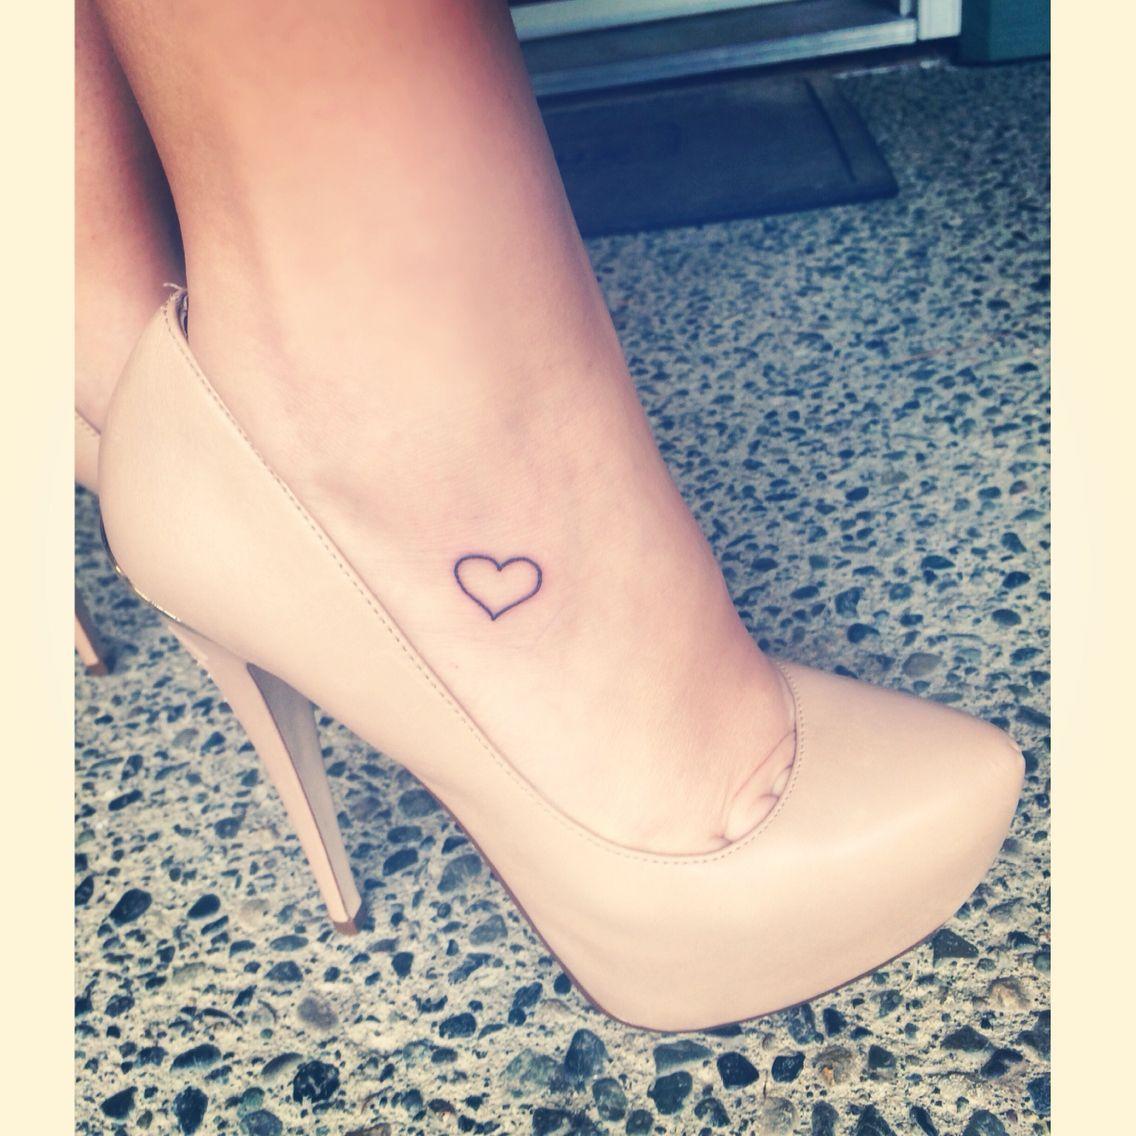 59e48786a Small heart tattoo on foot   tattoos   Feet tattoos, Small heart ...